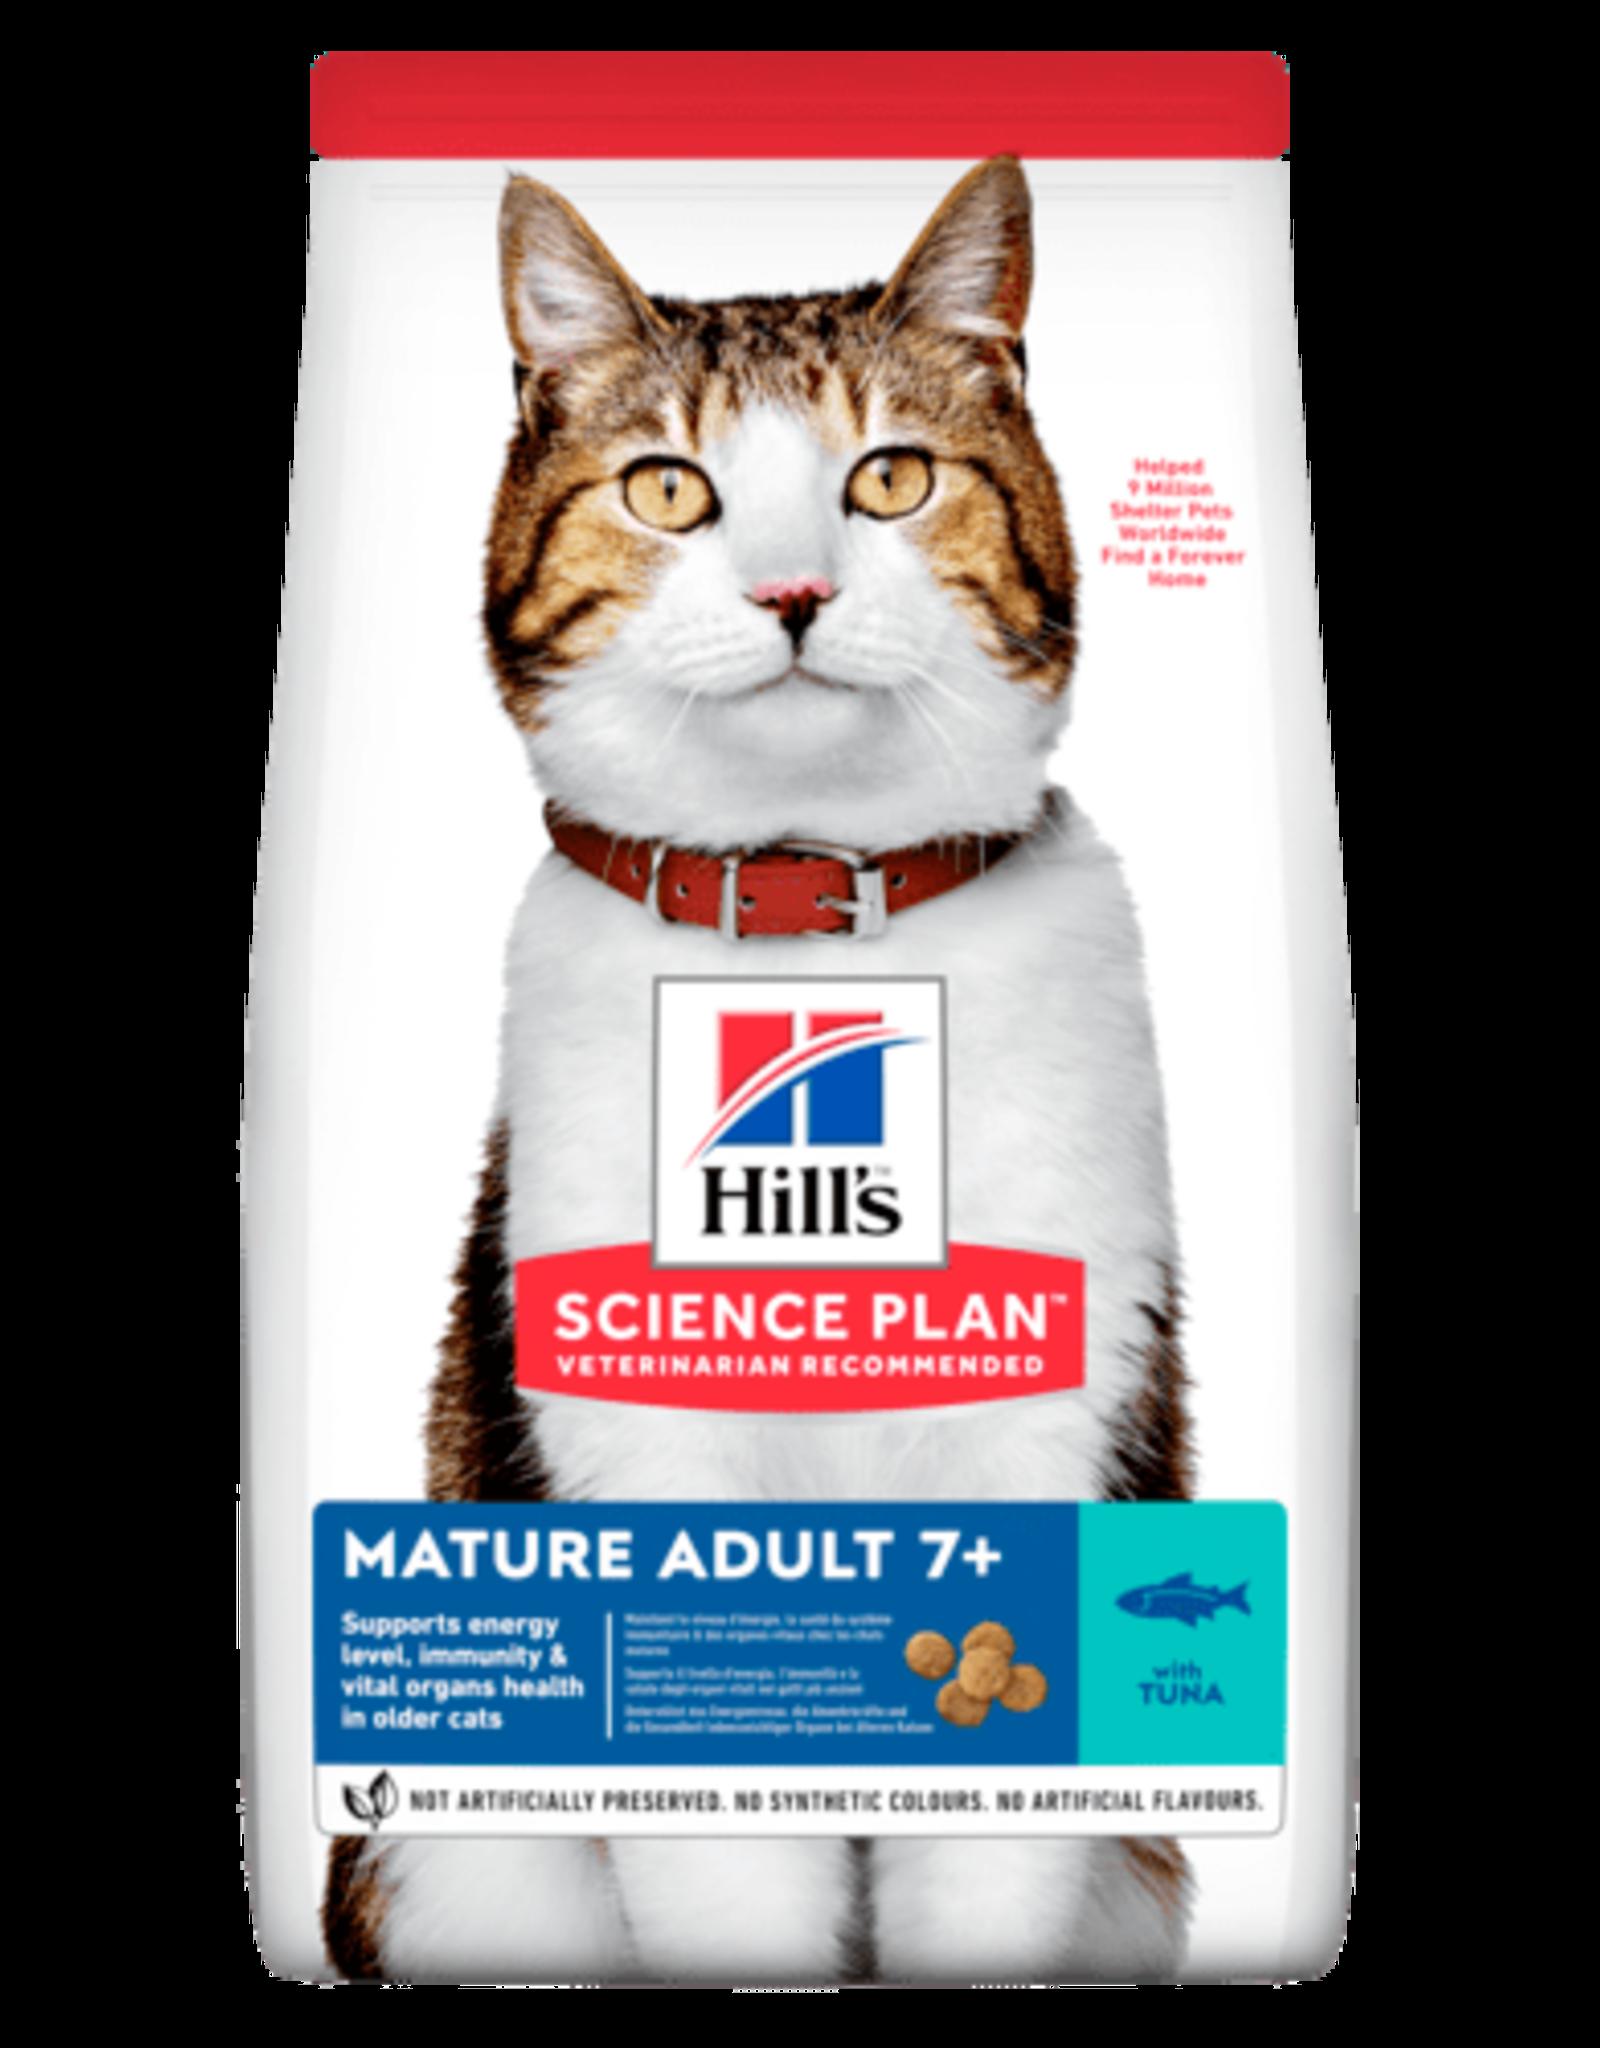 Hill's Science Plan Mature Adult 7+ Cat Dry Food, Tuna 1.5kg